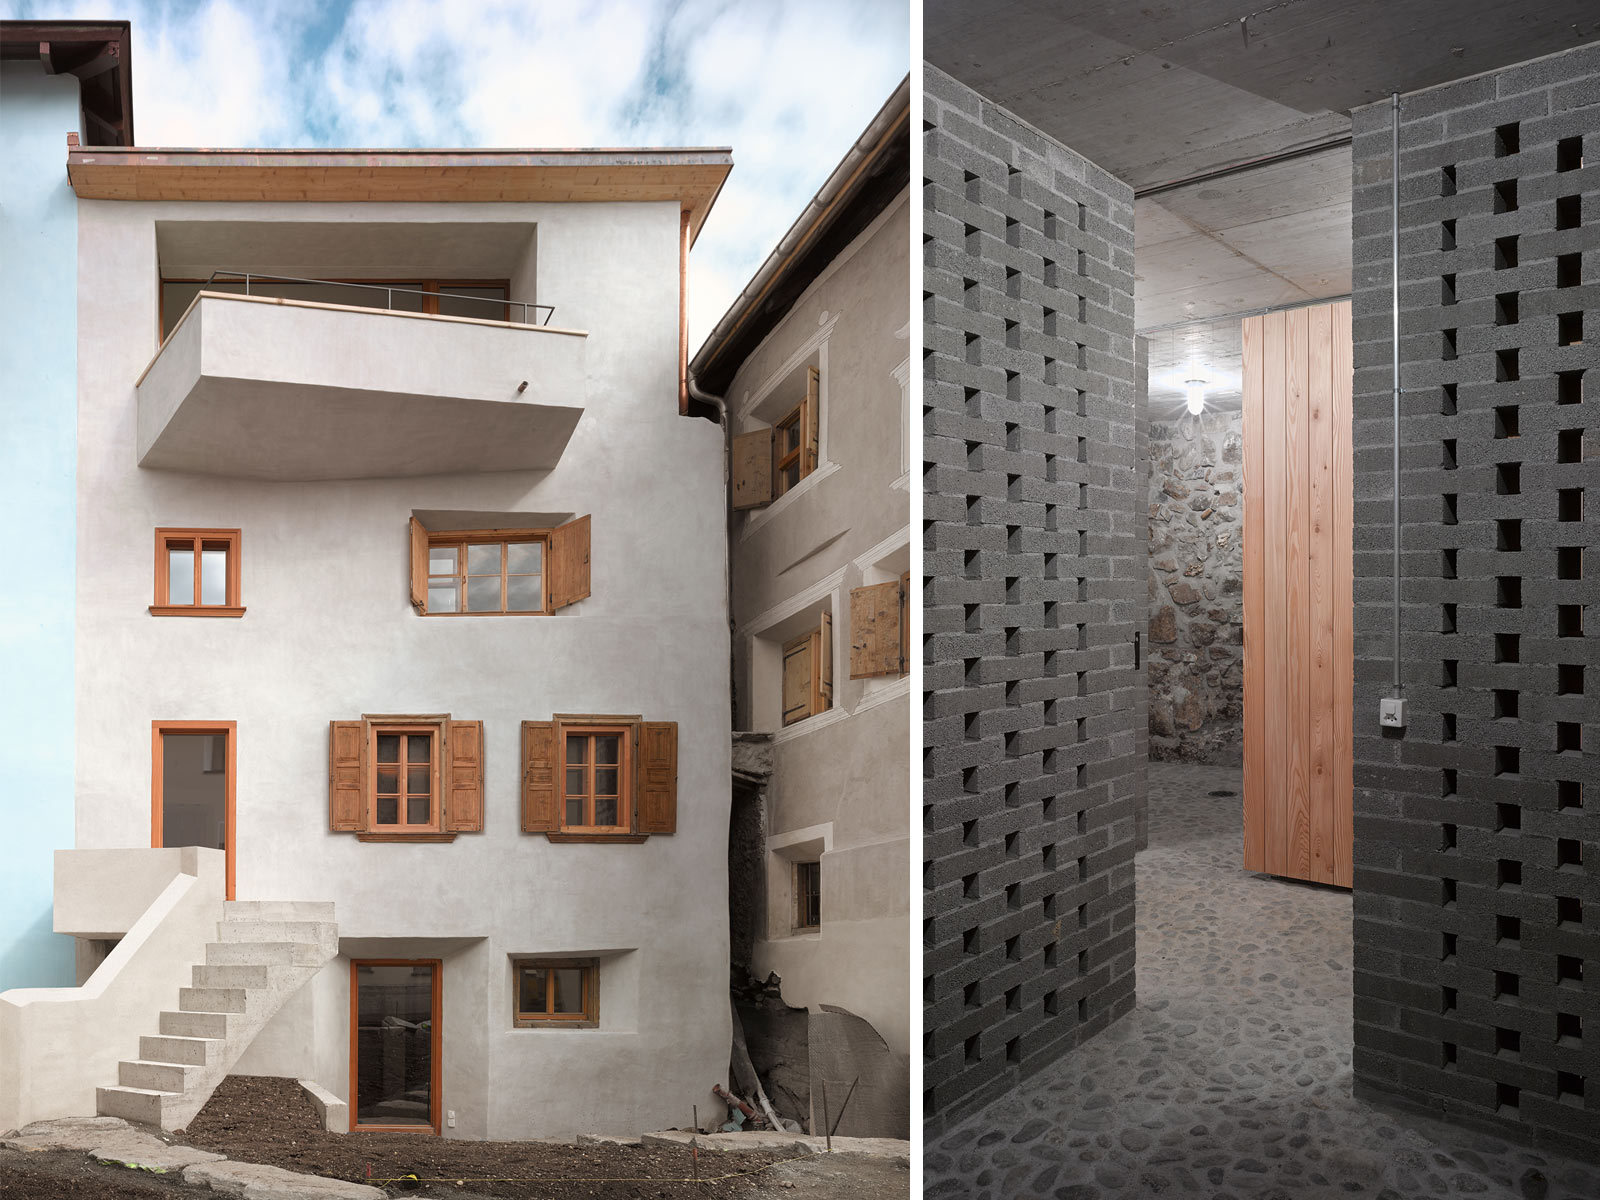 best architects architektur award corinna menn corinna menn umbau chesa gabriel. Black Bedroom Furniture Sets. Home Design Ideas